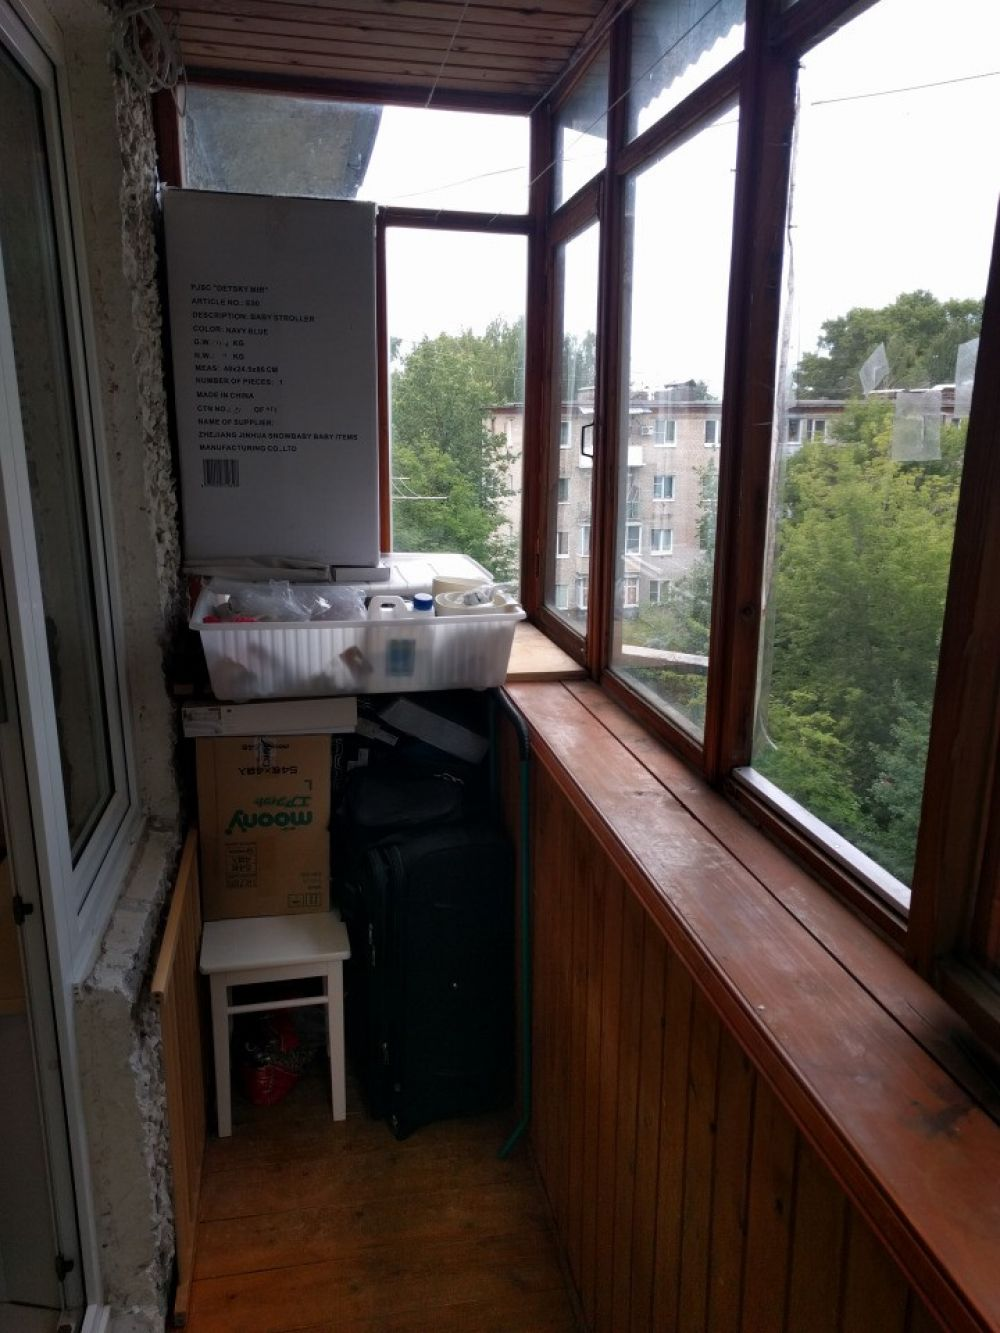 1-к квартира, Щелково, Парковая улица, 9А, фото 17